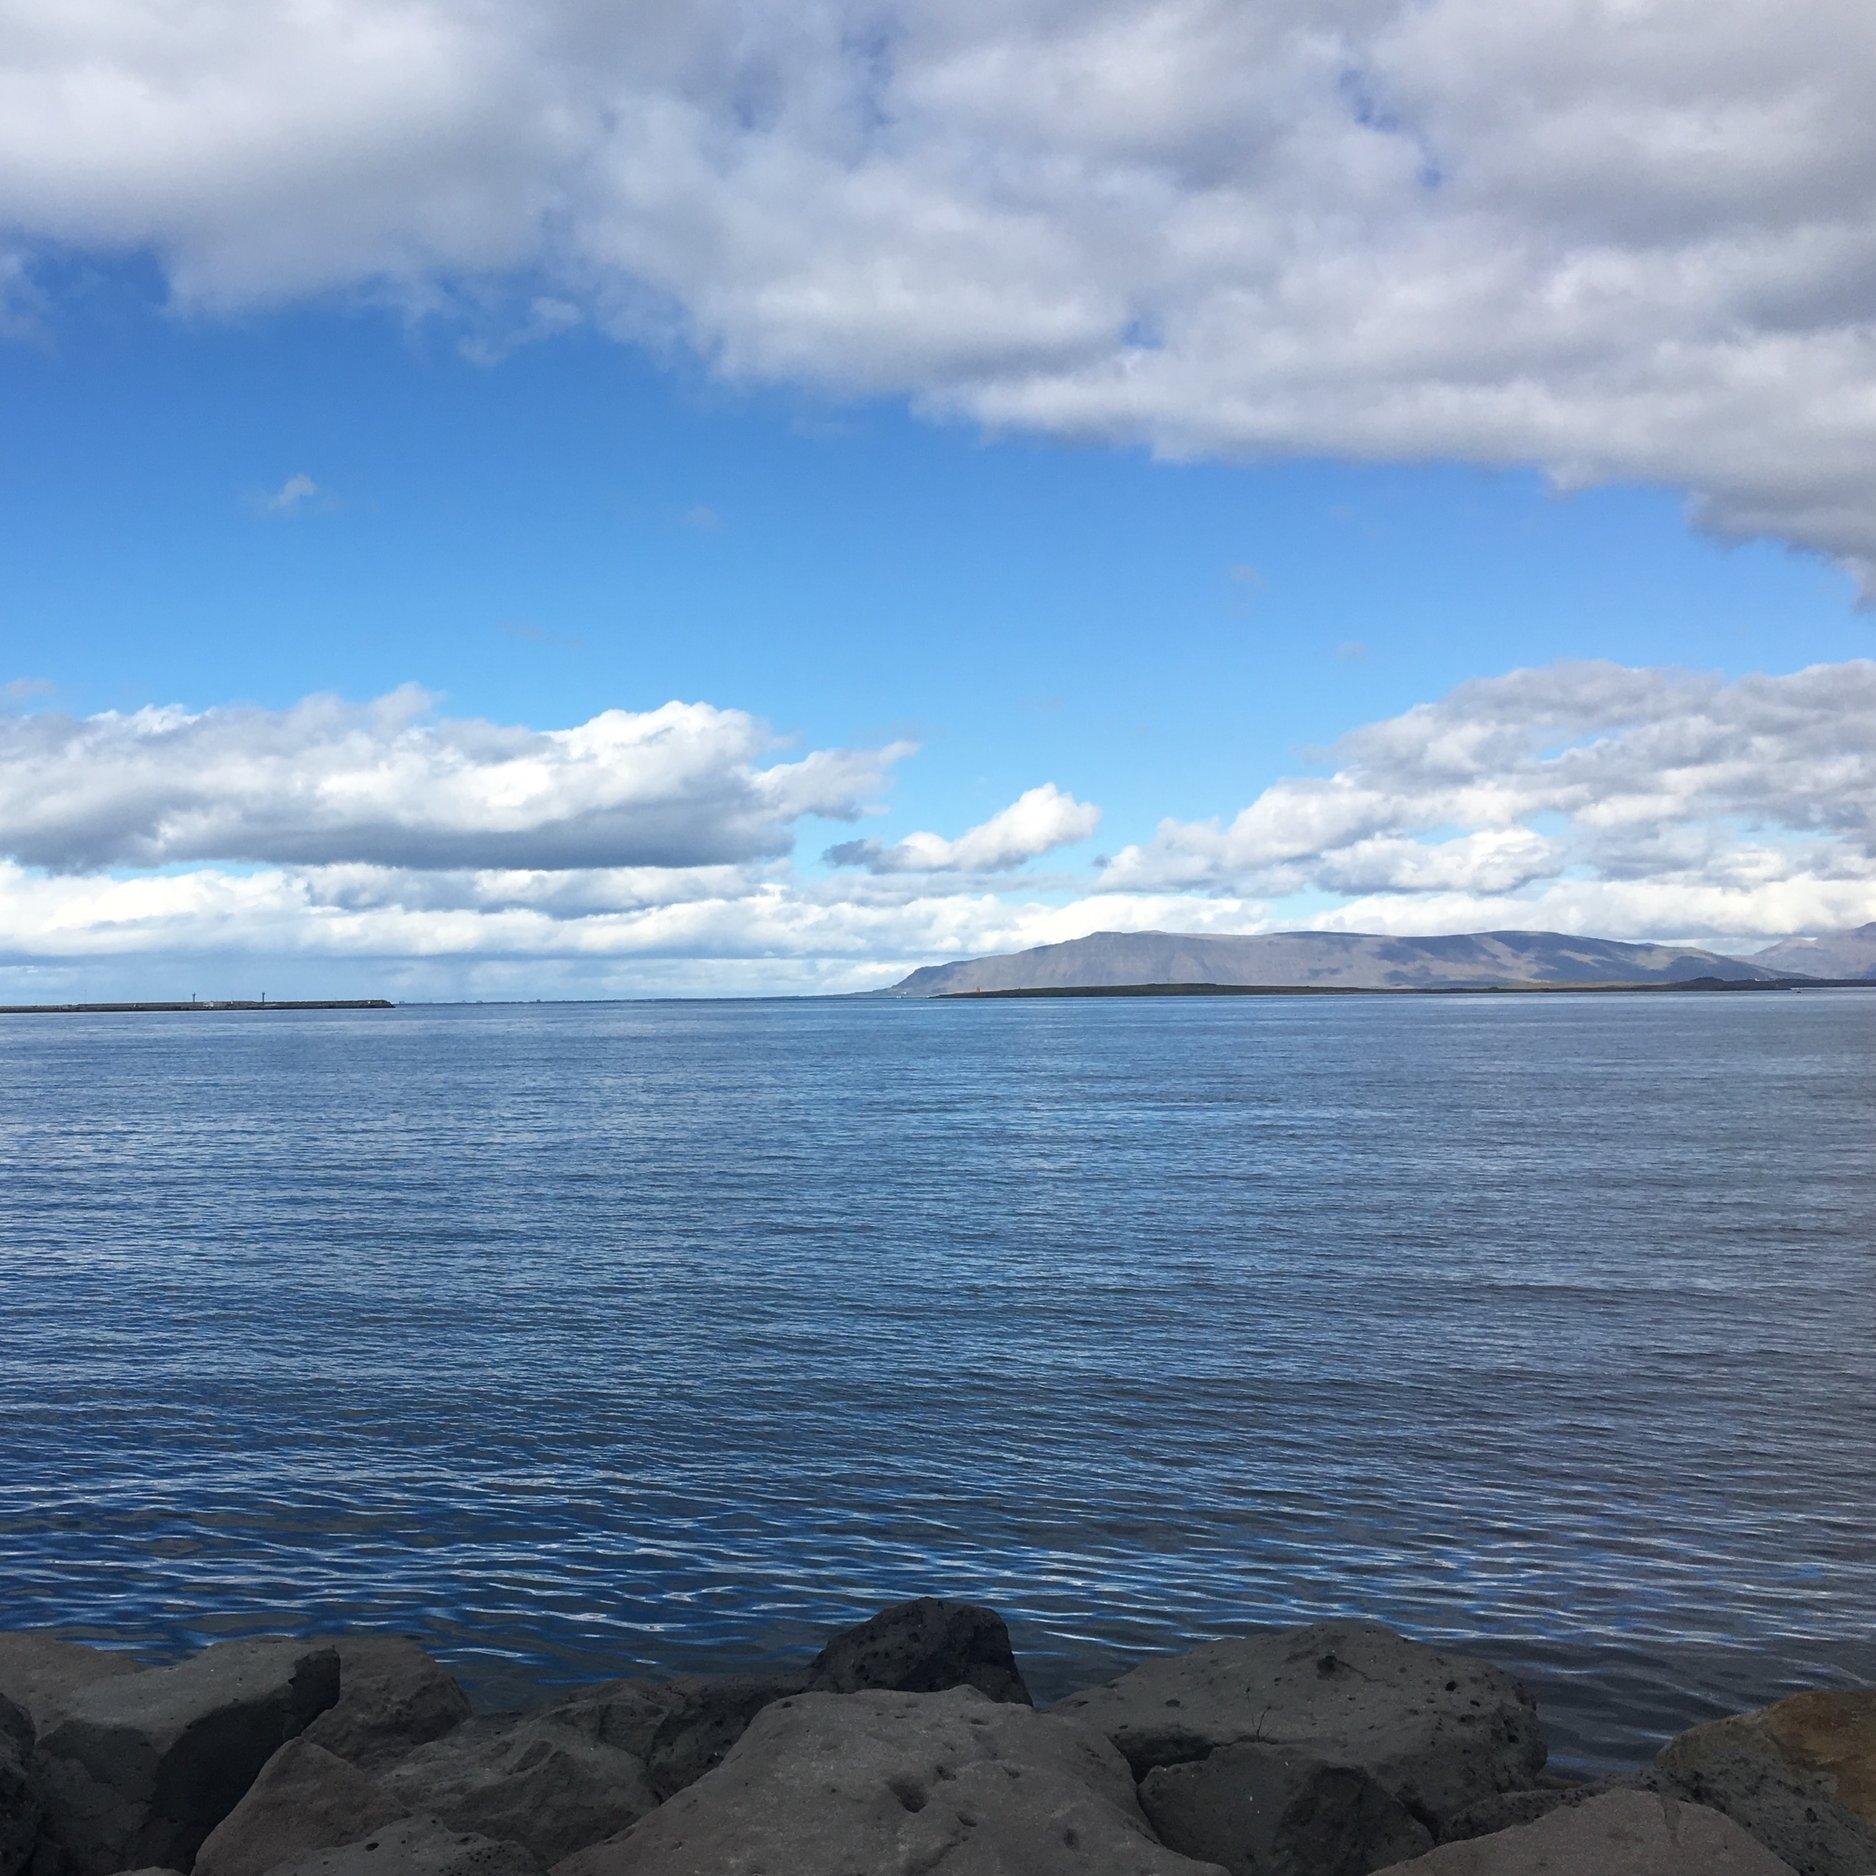 Harbour, Reykjavik by The Doubtful Traveller